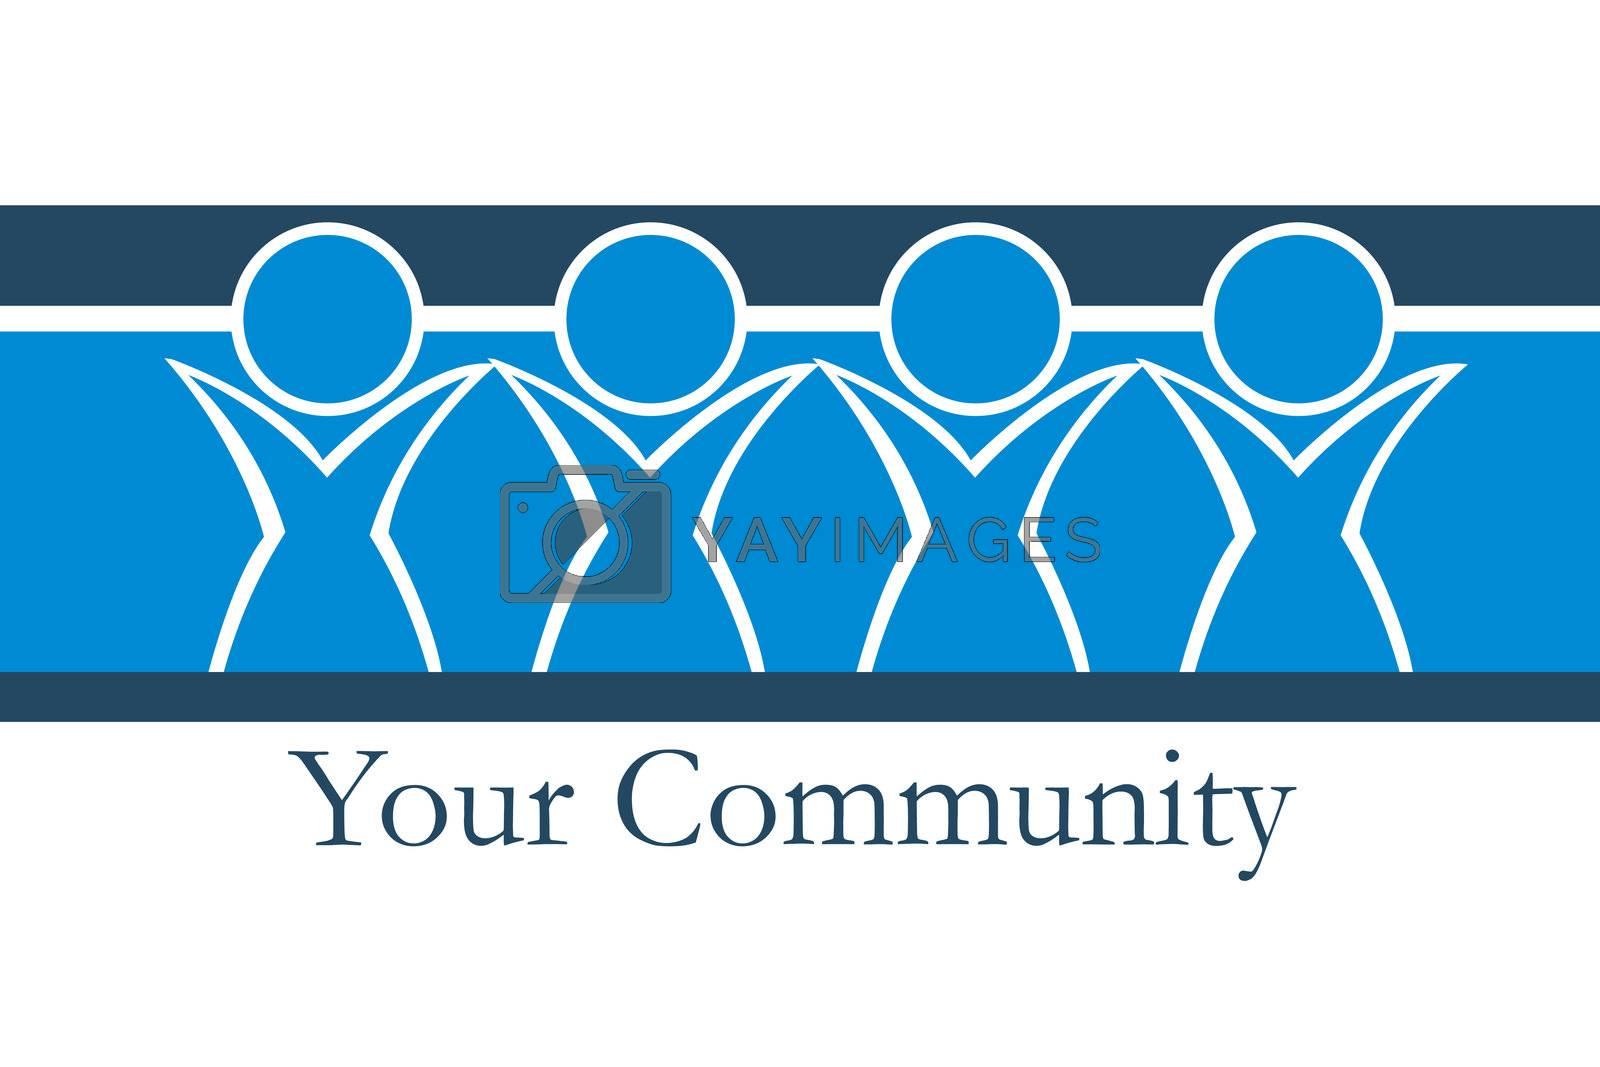 illustration of your community on white background